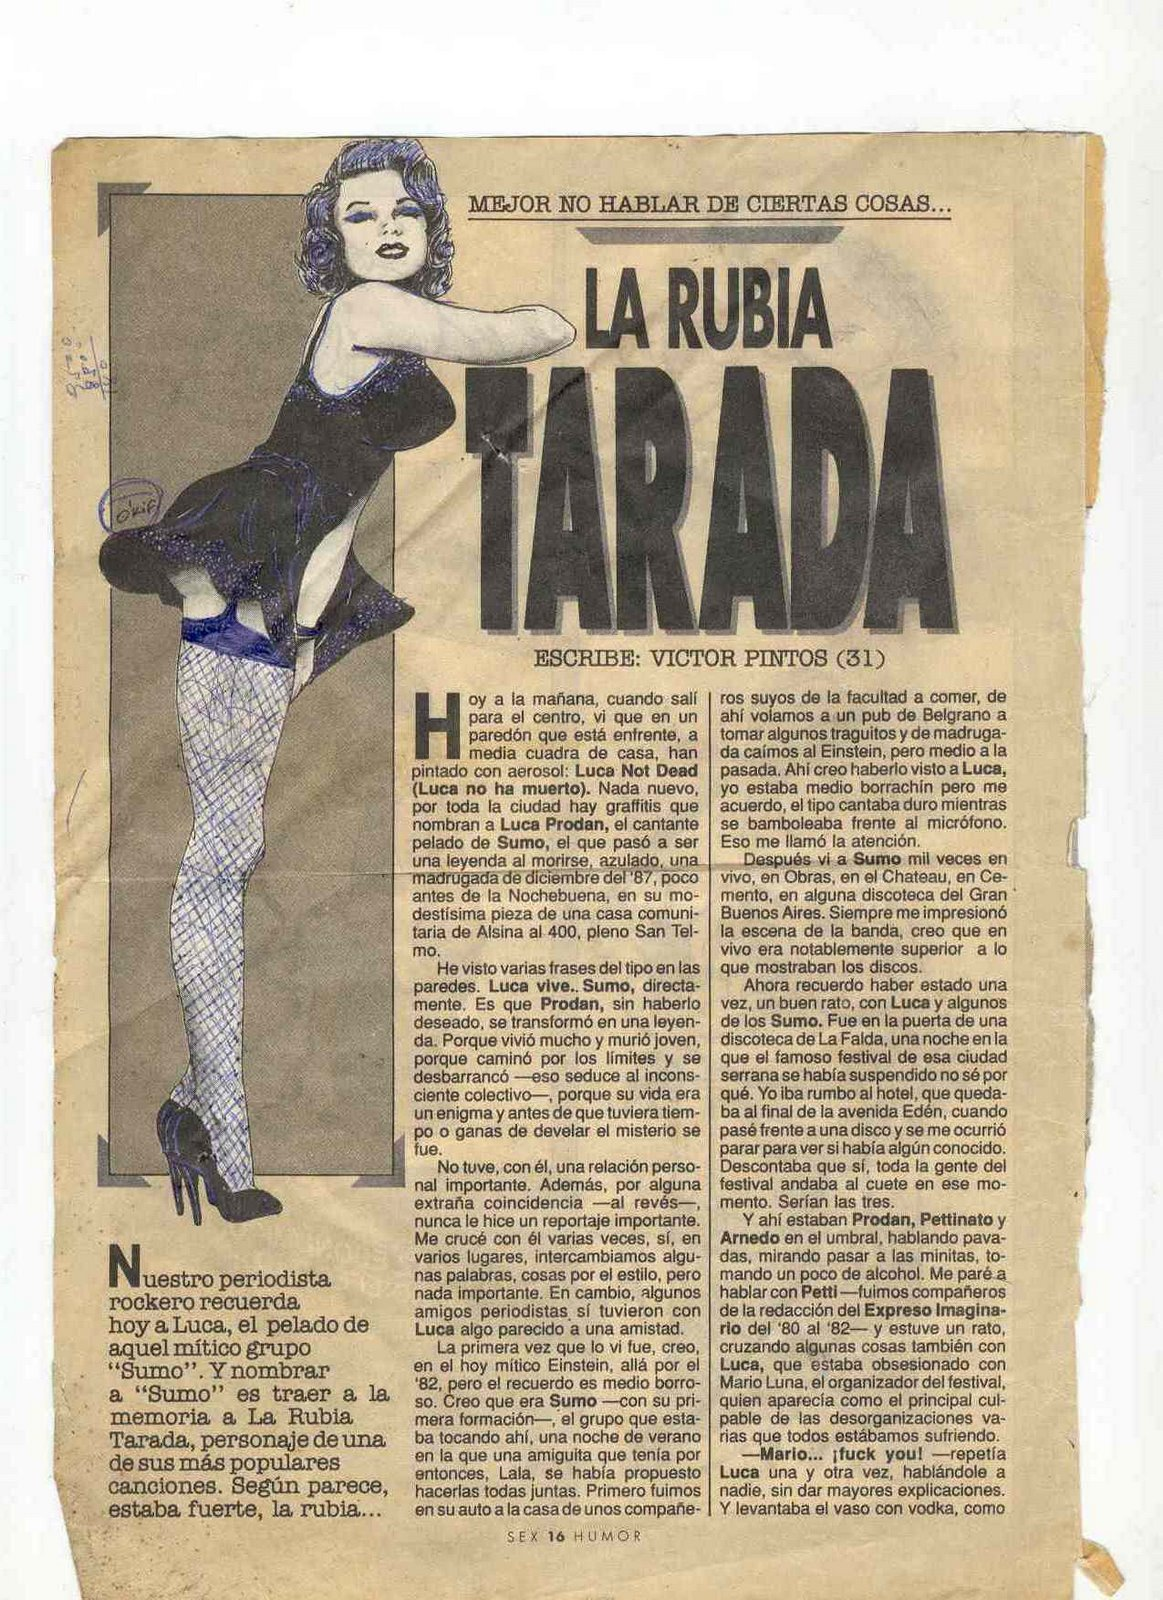 [La_rubia_tarada_1.jpg]